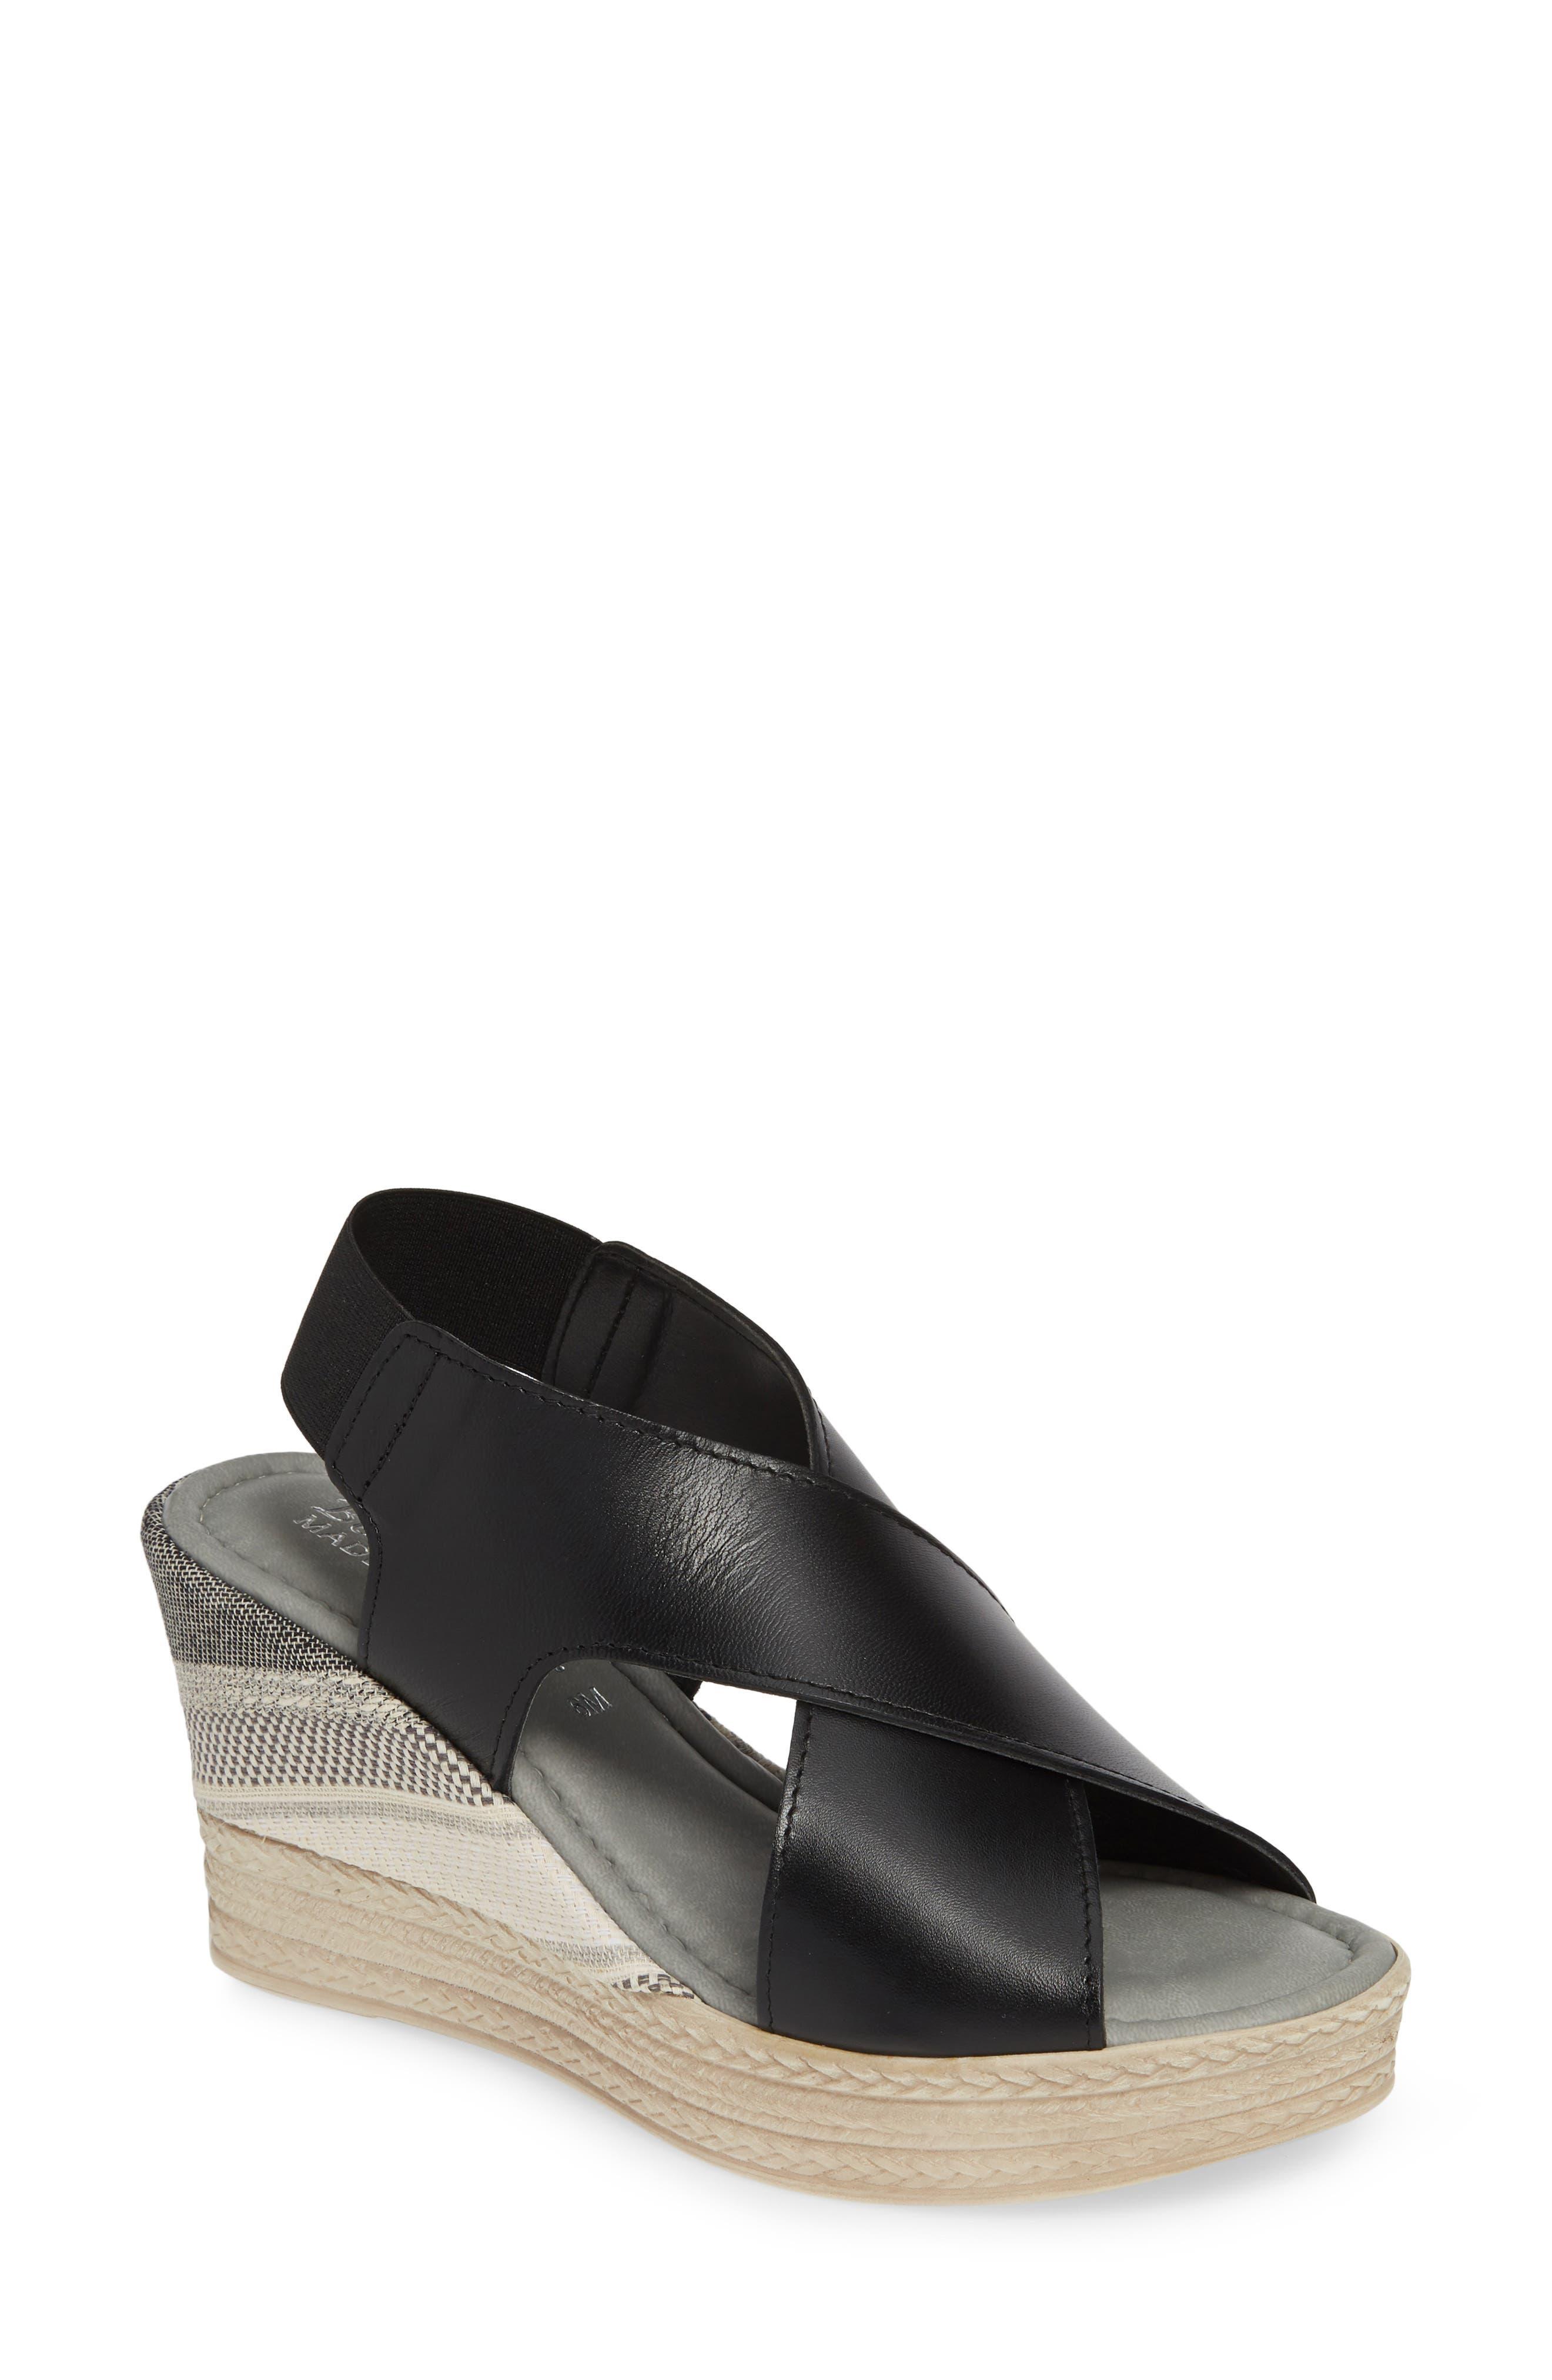 BELLA VITA Slingback Sandal, Main, color, BLACK ITALIAN LEATHER